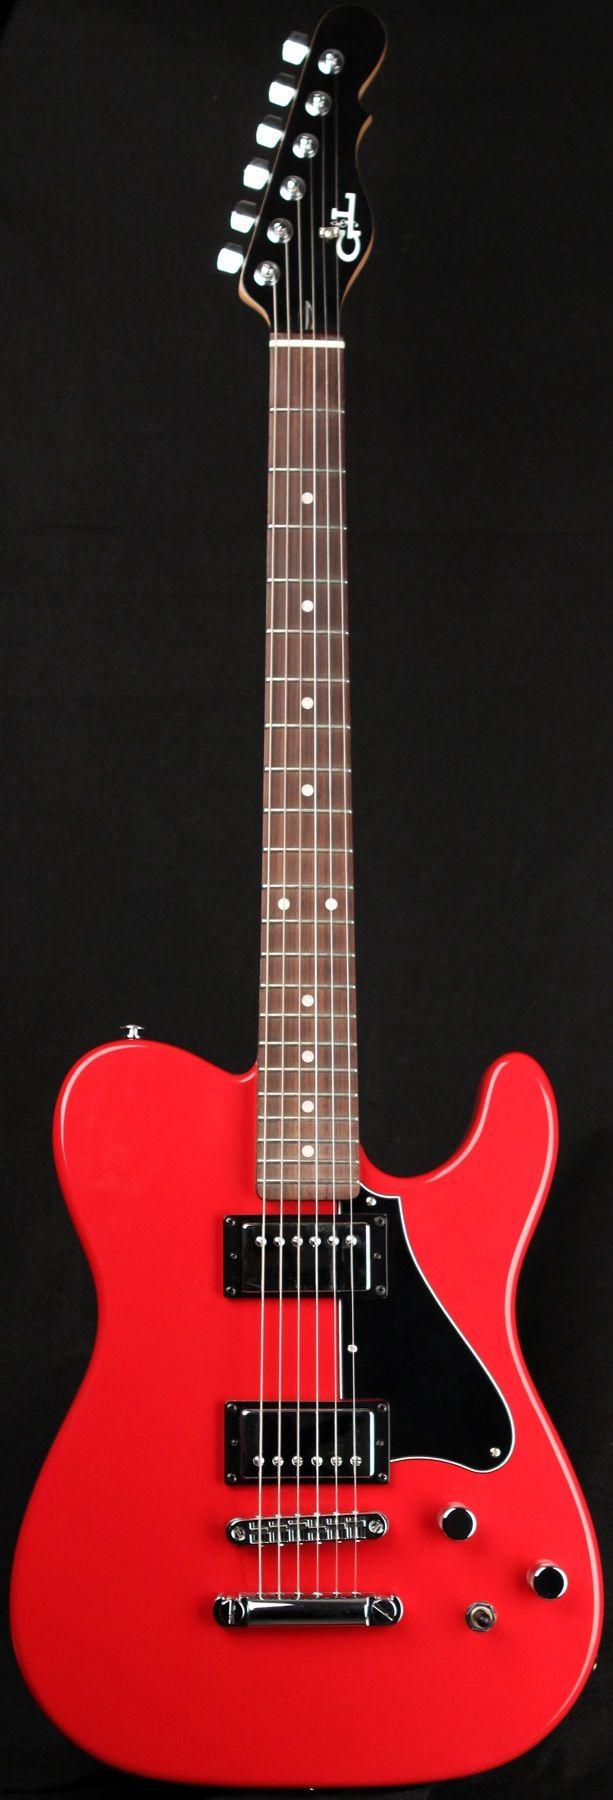 G&L Guitars ASAT® Deluxe II,  Flame Red over Alder